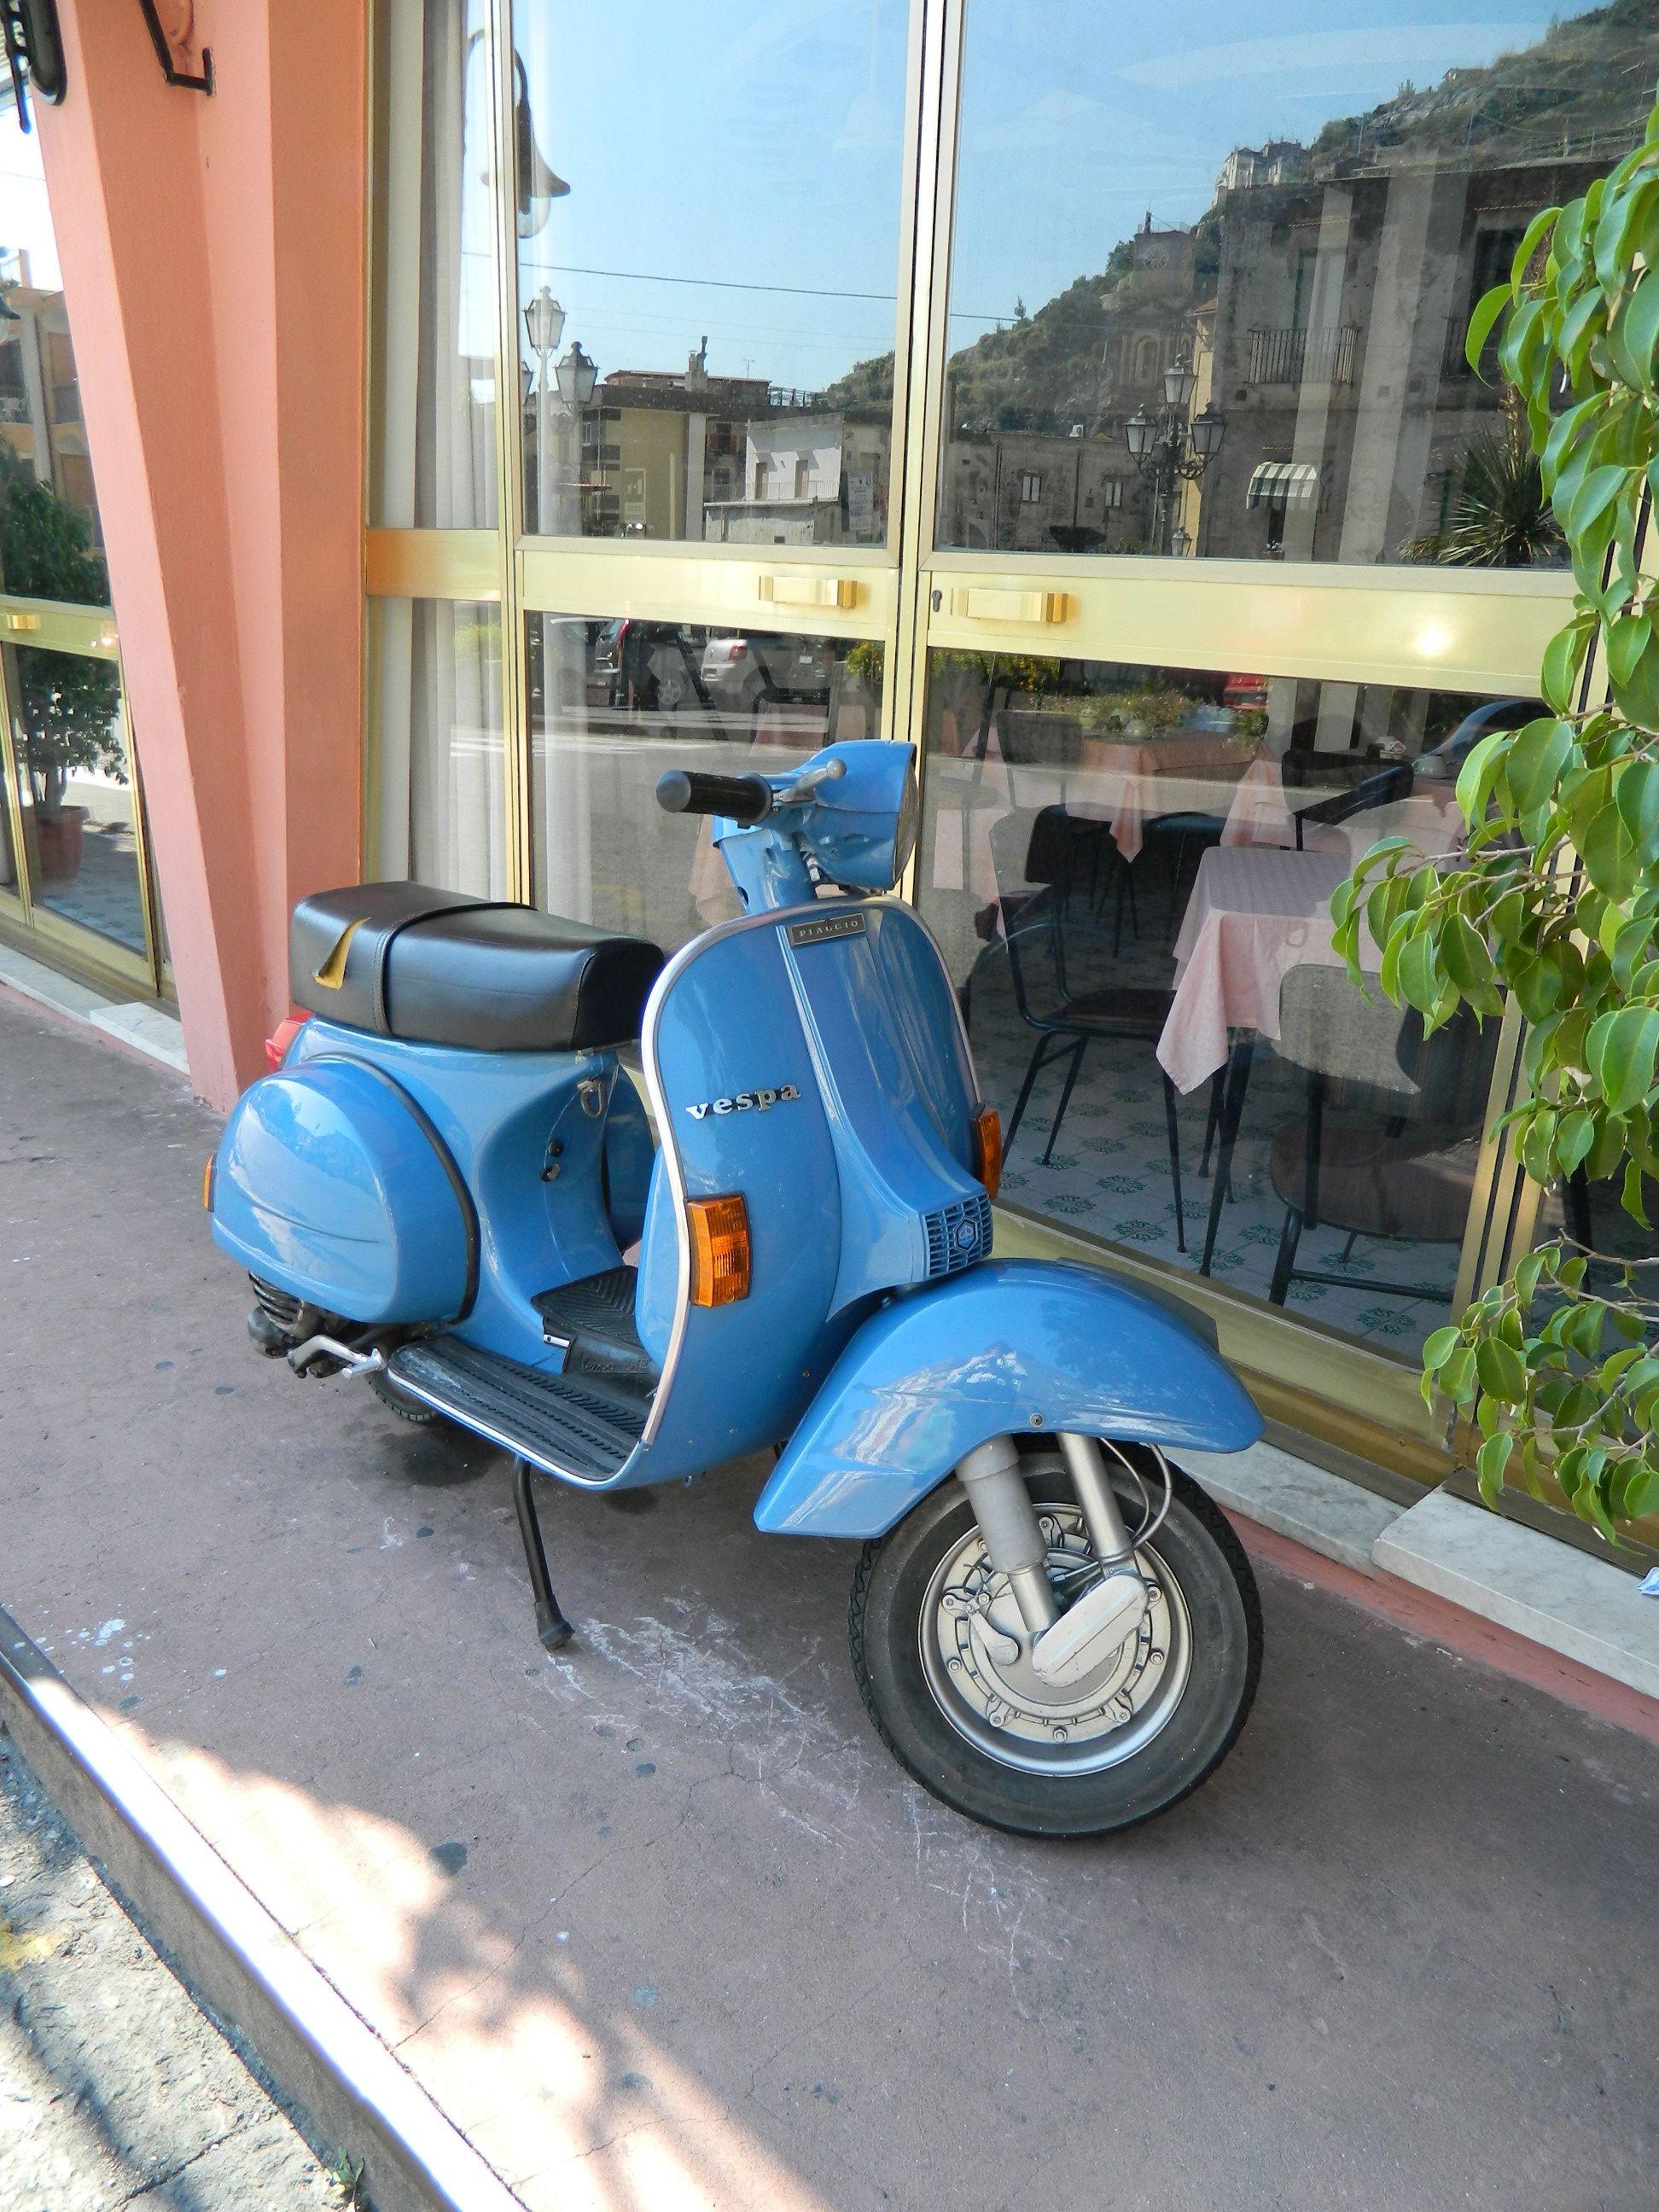 Vespa Scooters of Minori, Italy